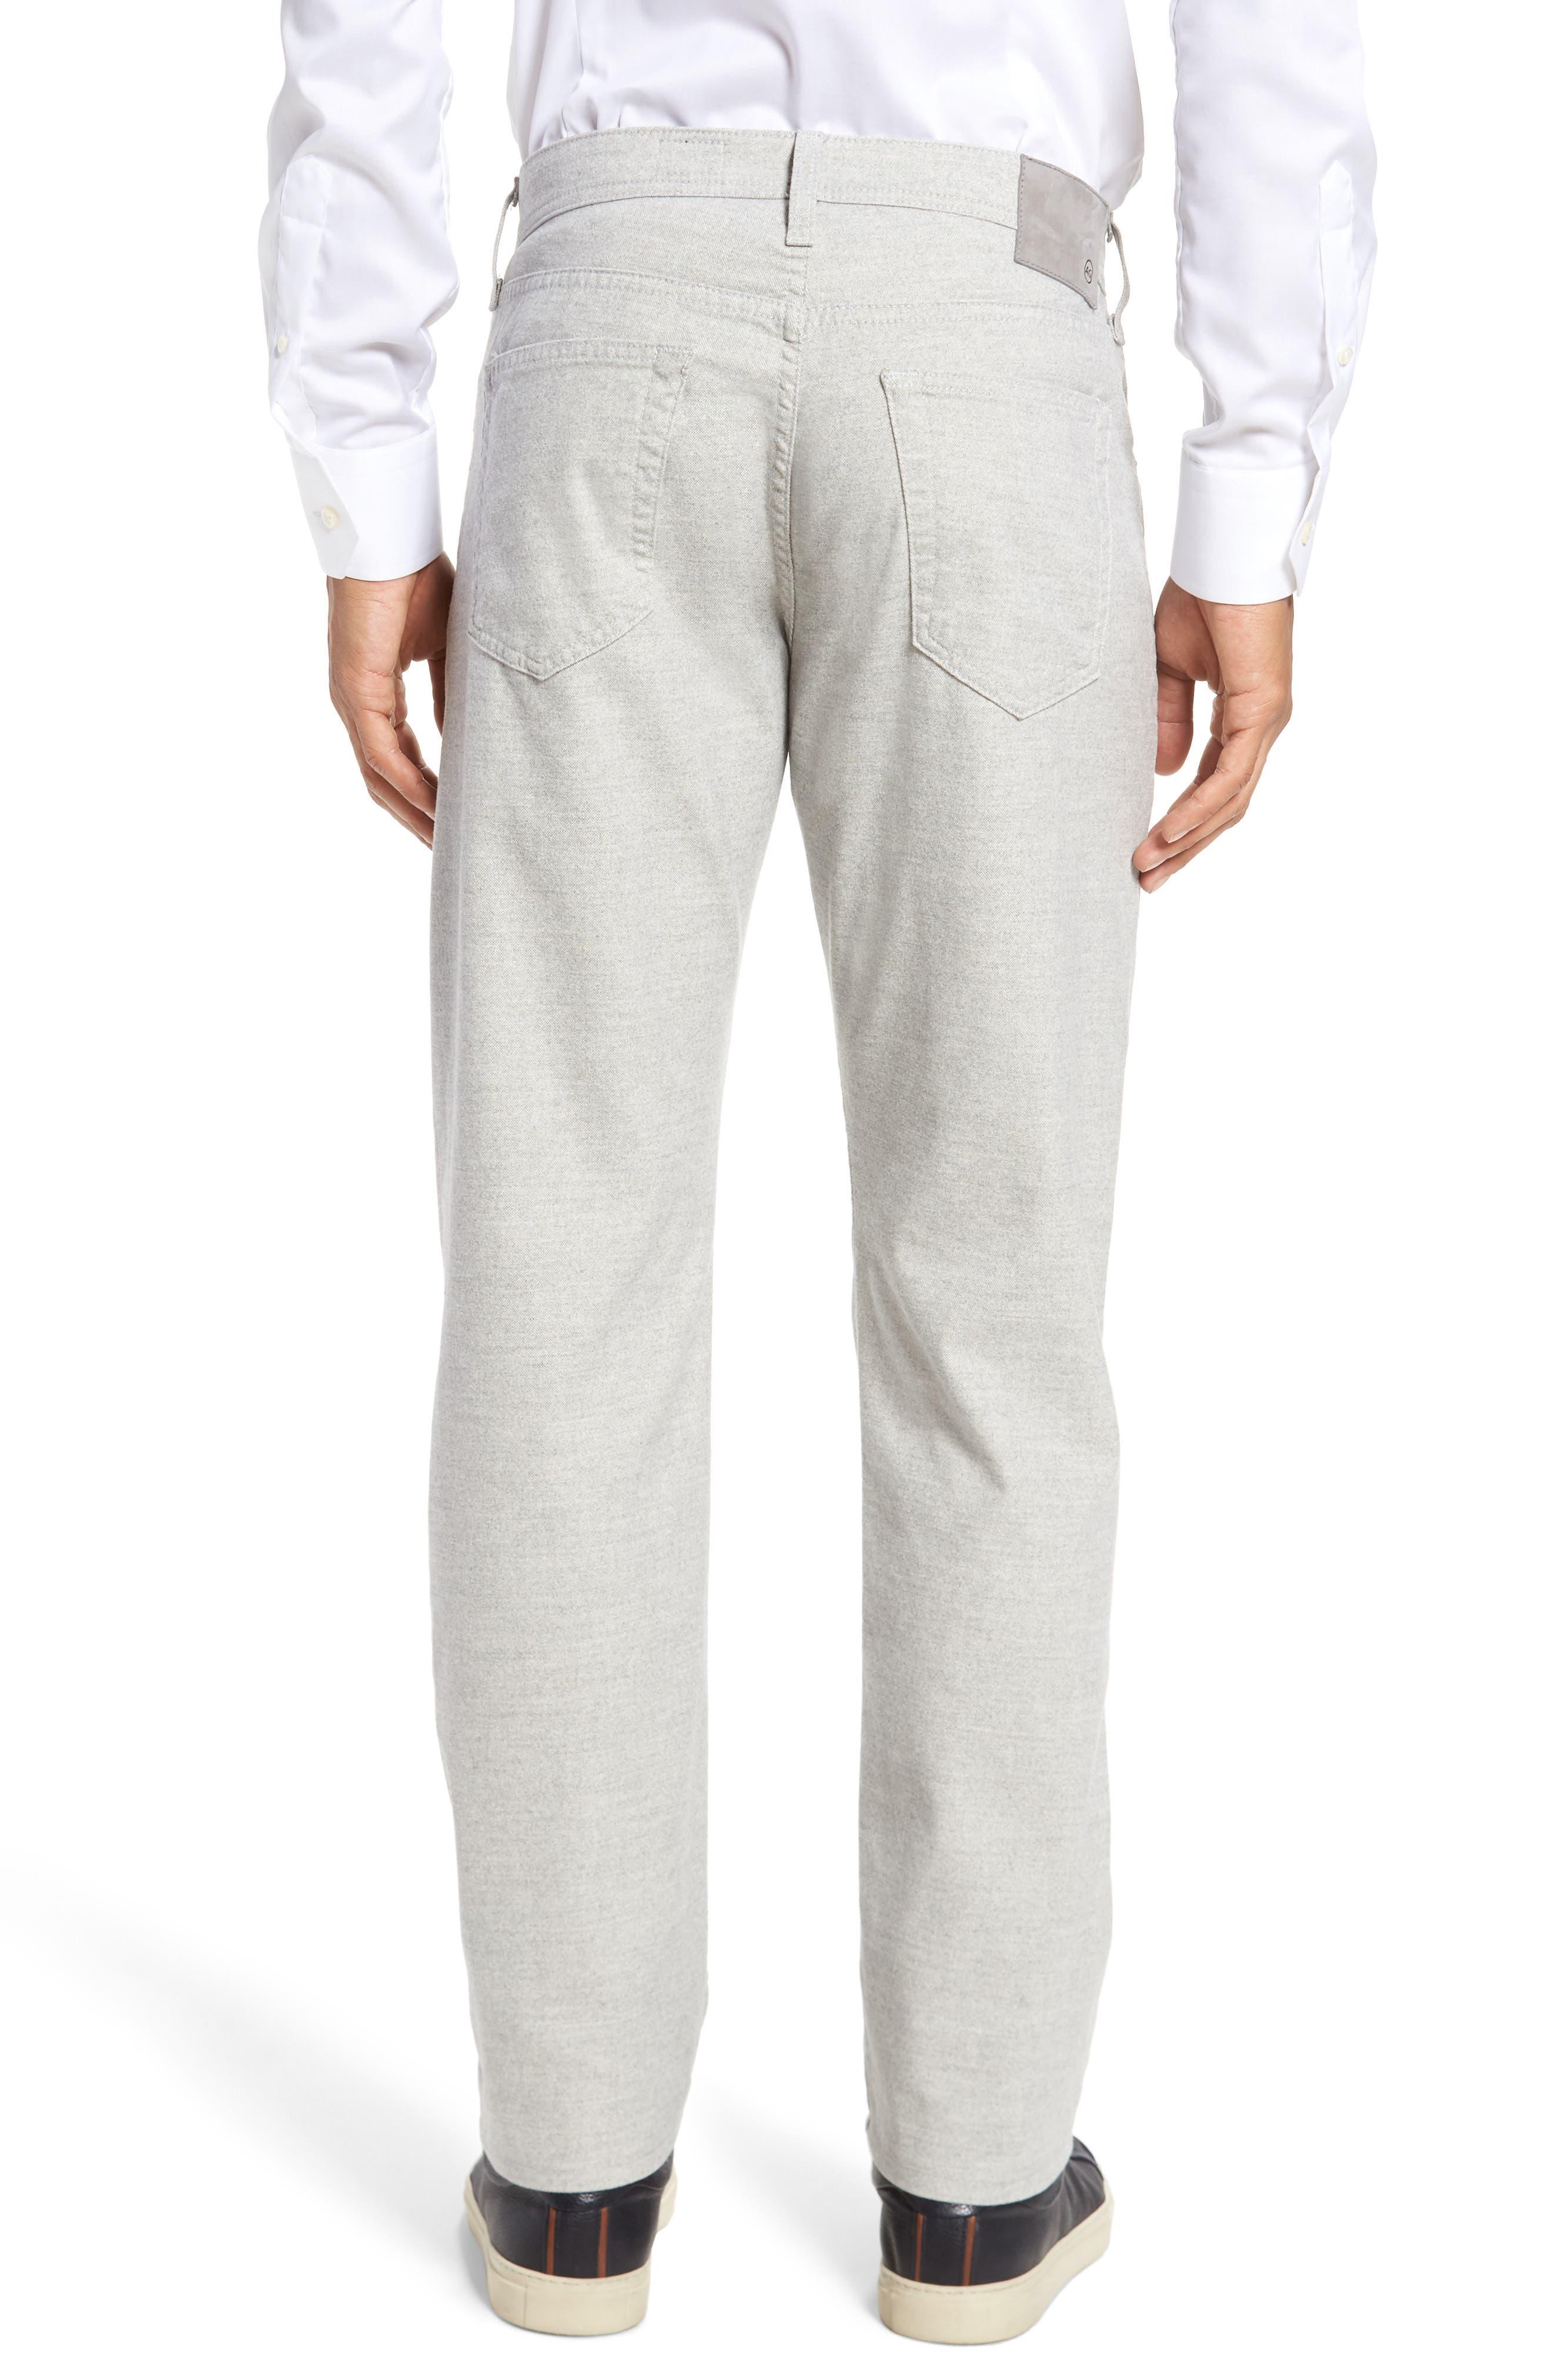 Graduate Tailored Five-Pocket Straight Leg Pants,                             Alternate thumbnail 2, color,                             020